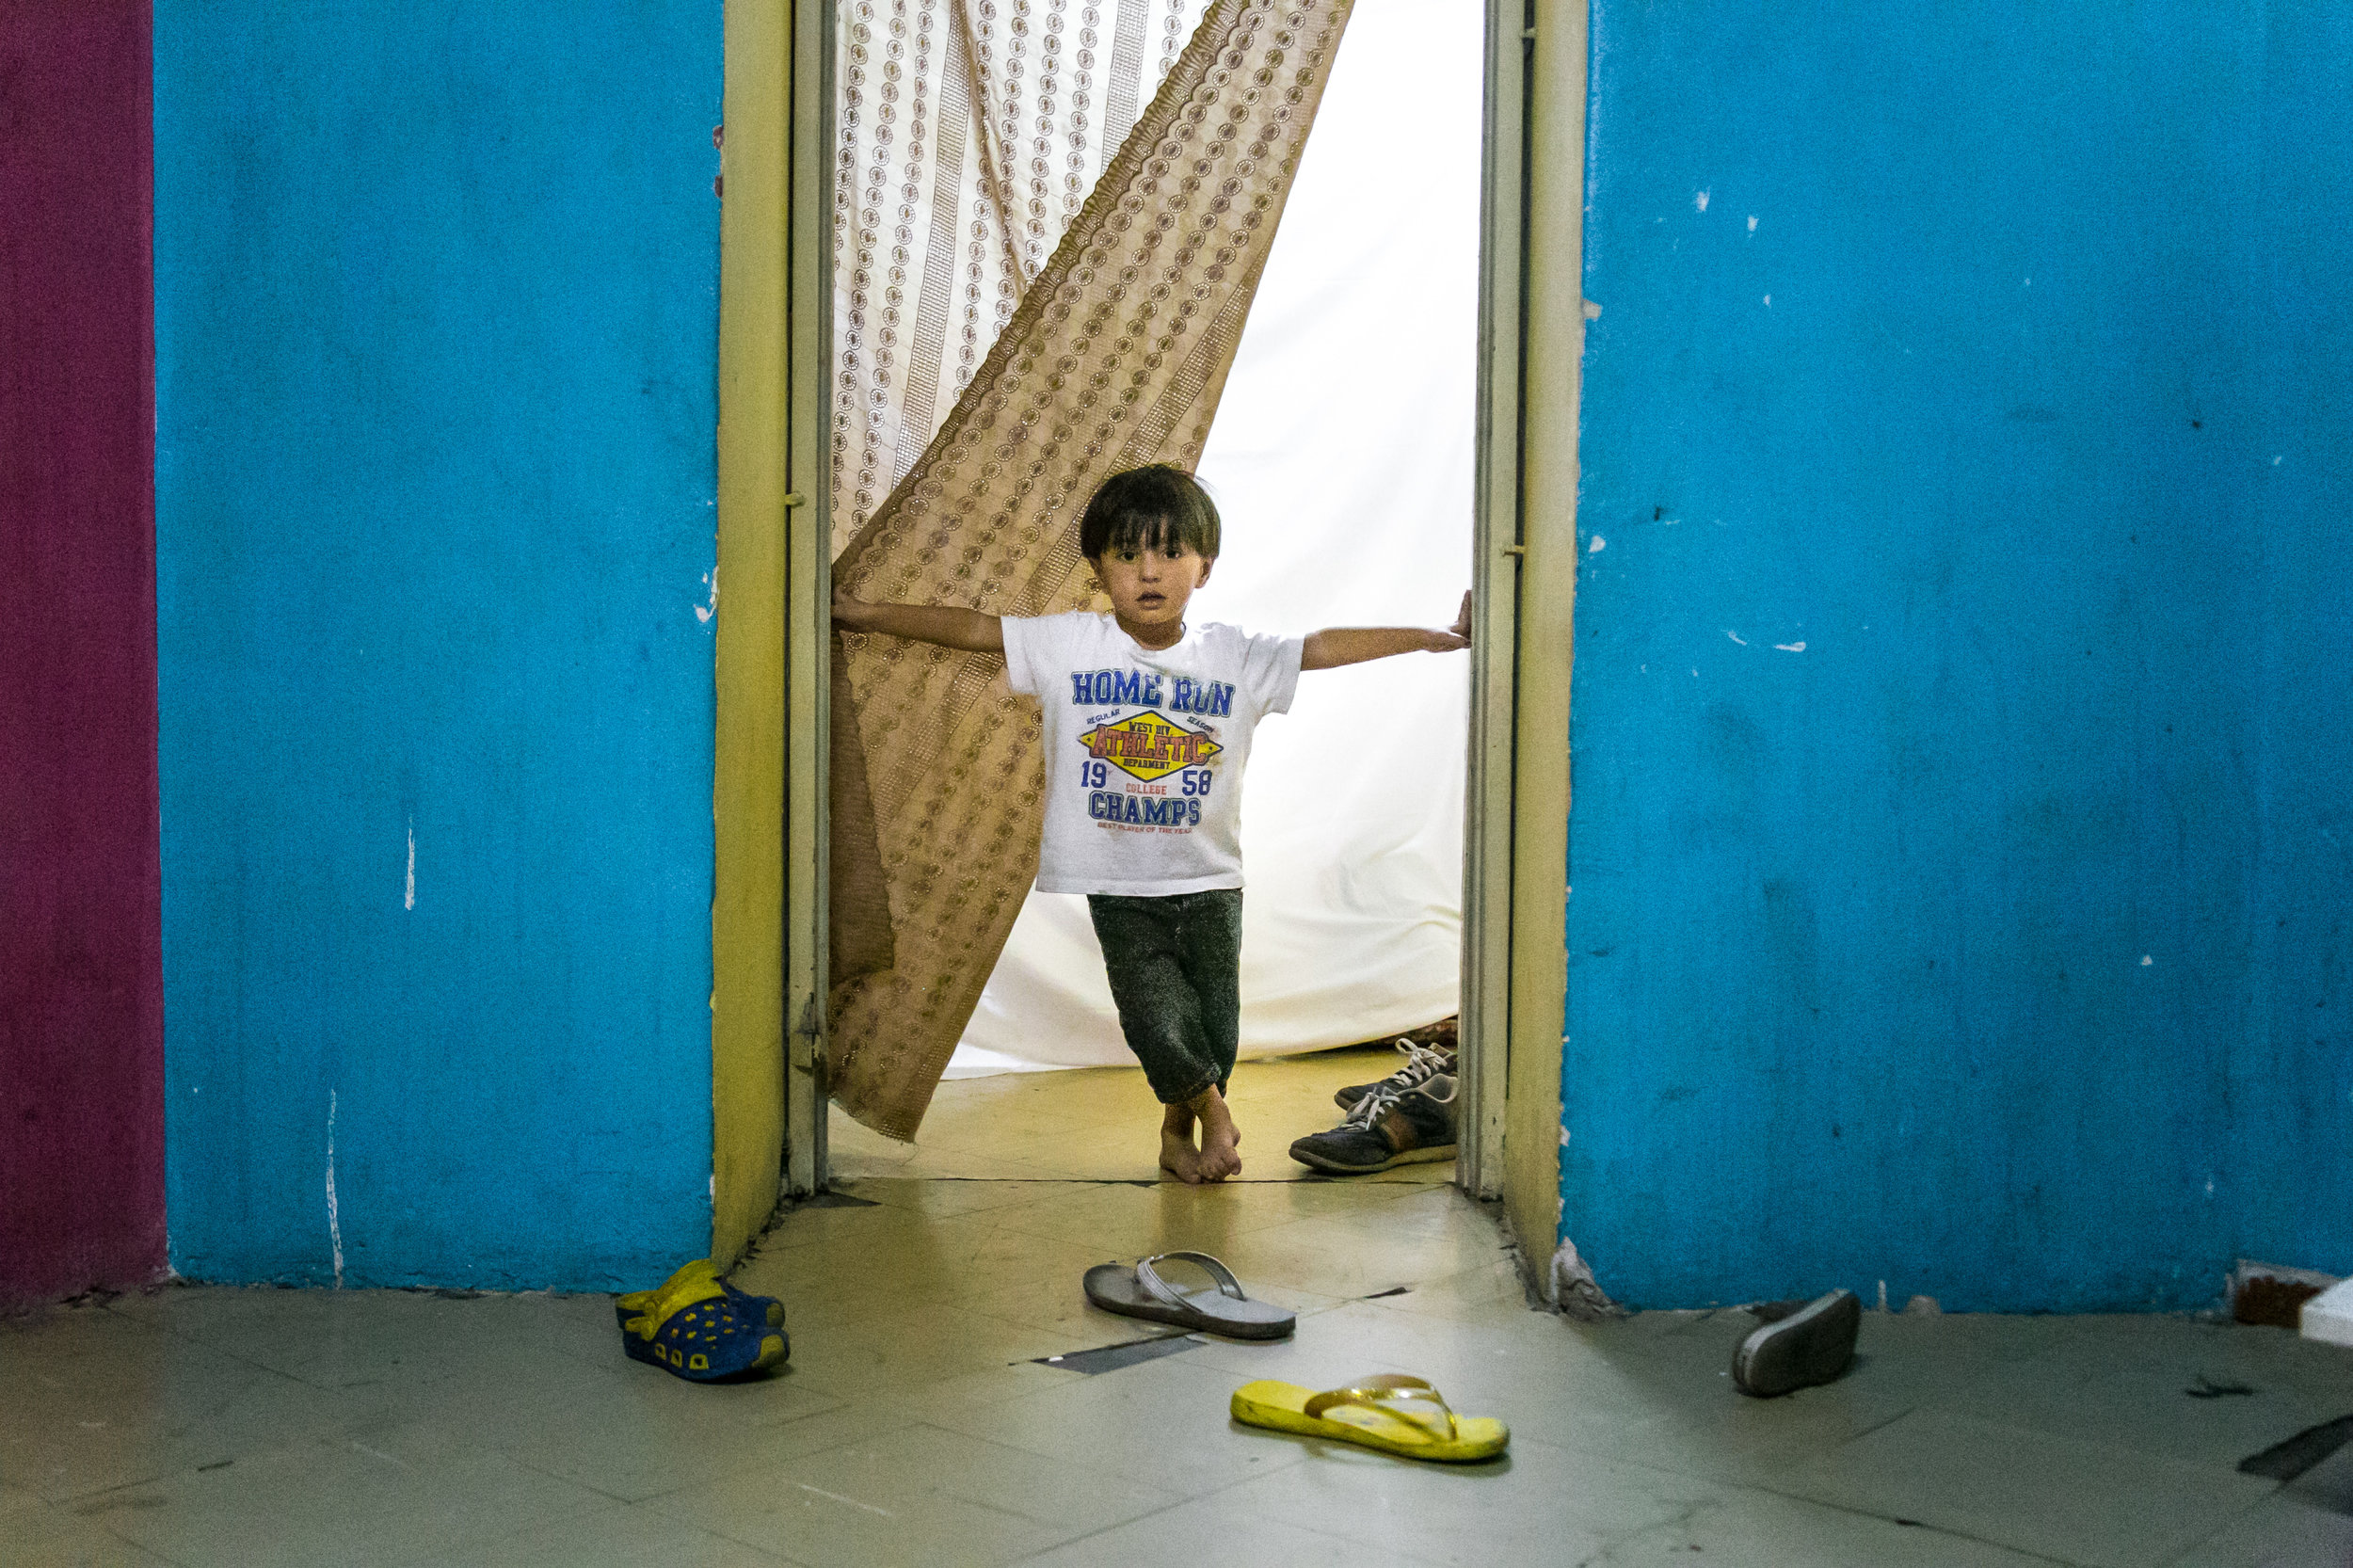 Jasmine Refugee Squat - The In-Between - Adobe Spark - Athens, Greece